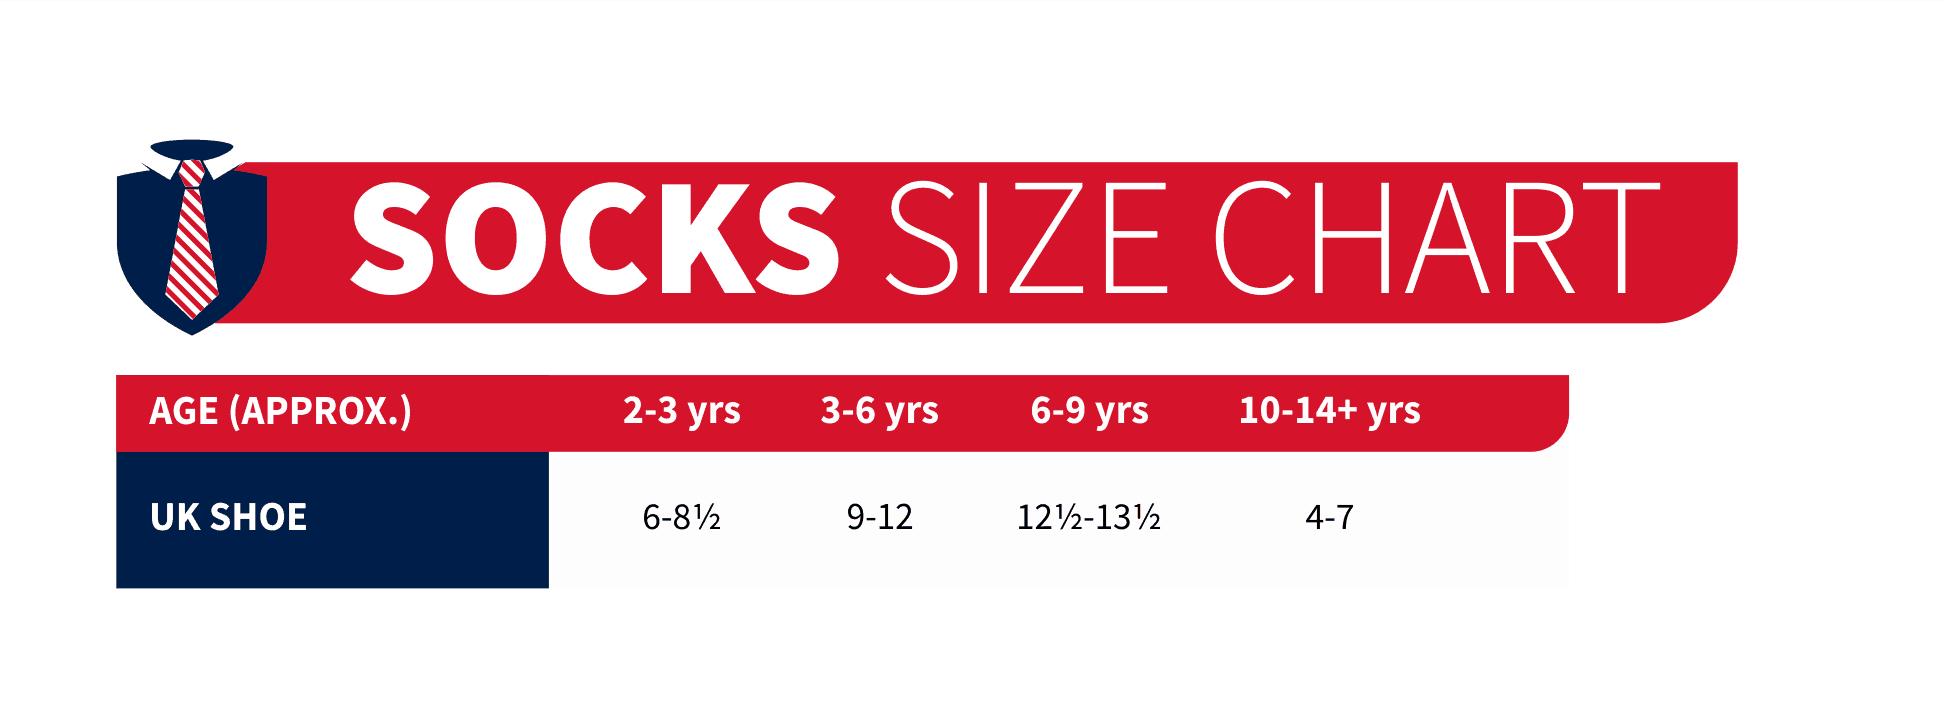 socks size chart